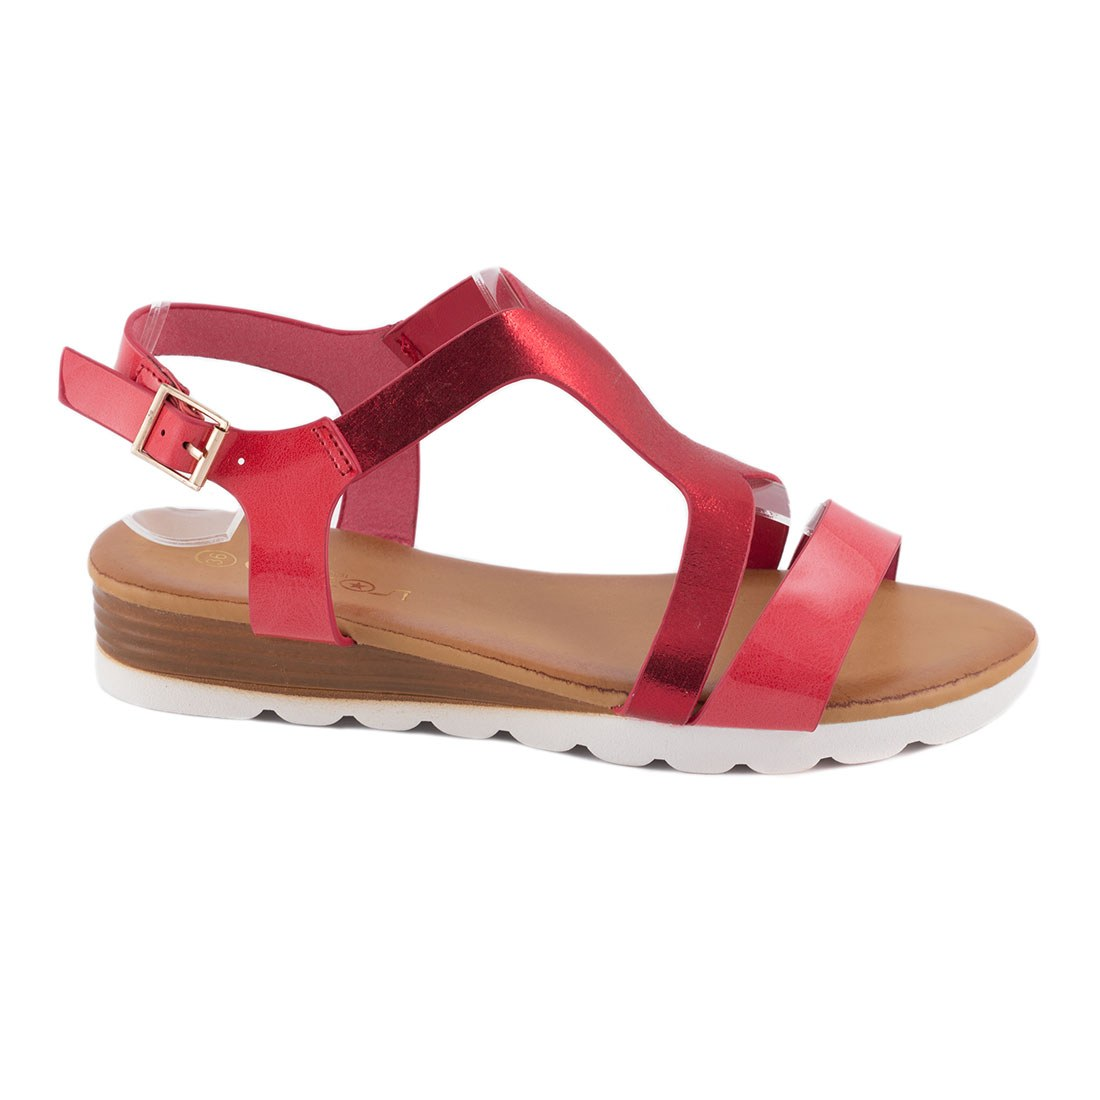 Sandale dama comode JS-5889-ROSU